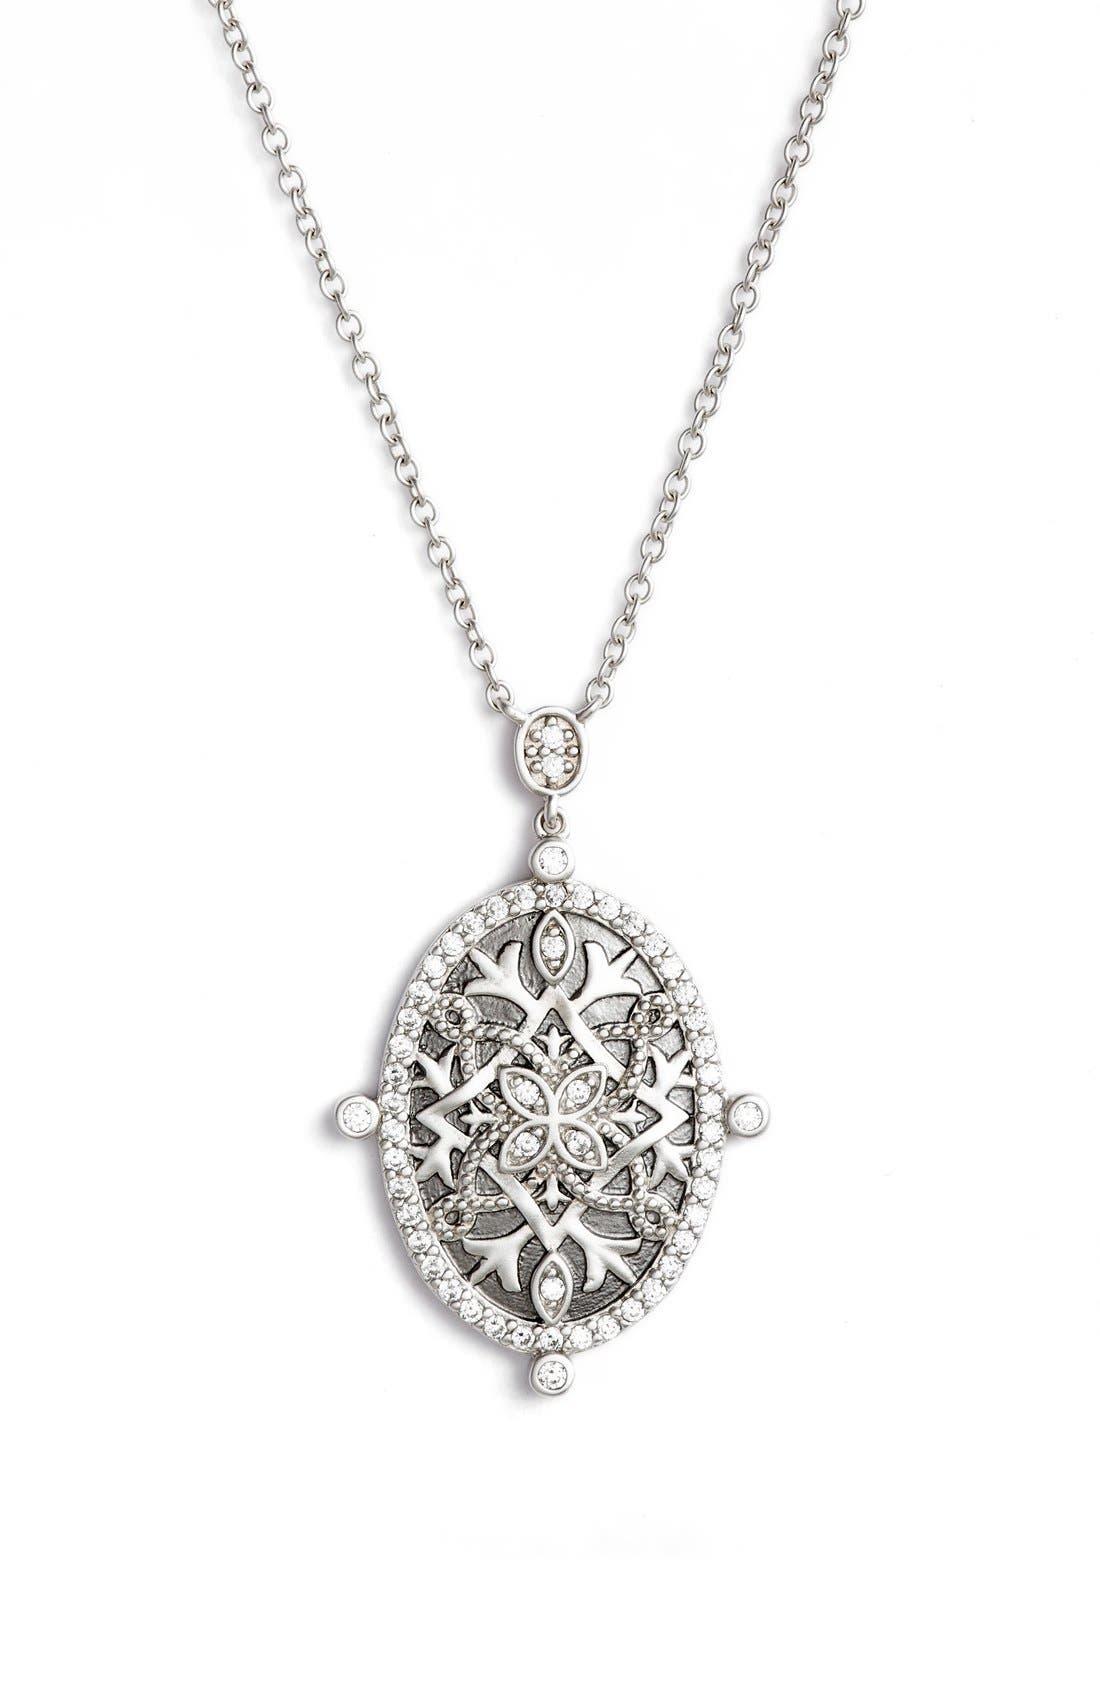 Contemporary Deco Celestial Pendant Necklace,                         Main,                         color, Silver/ Black